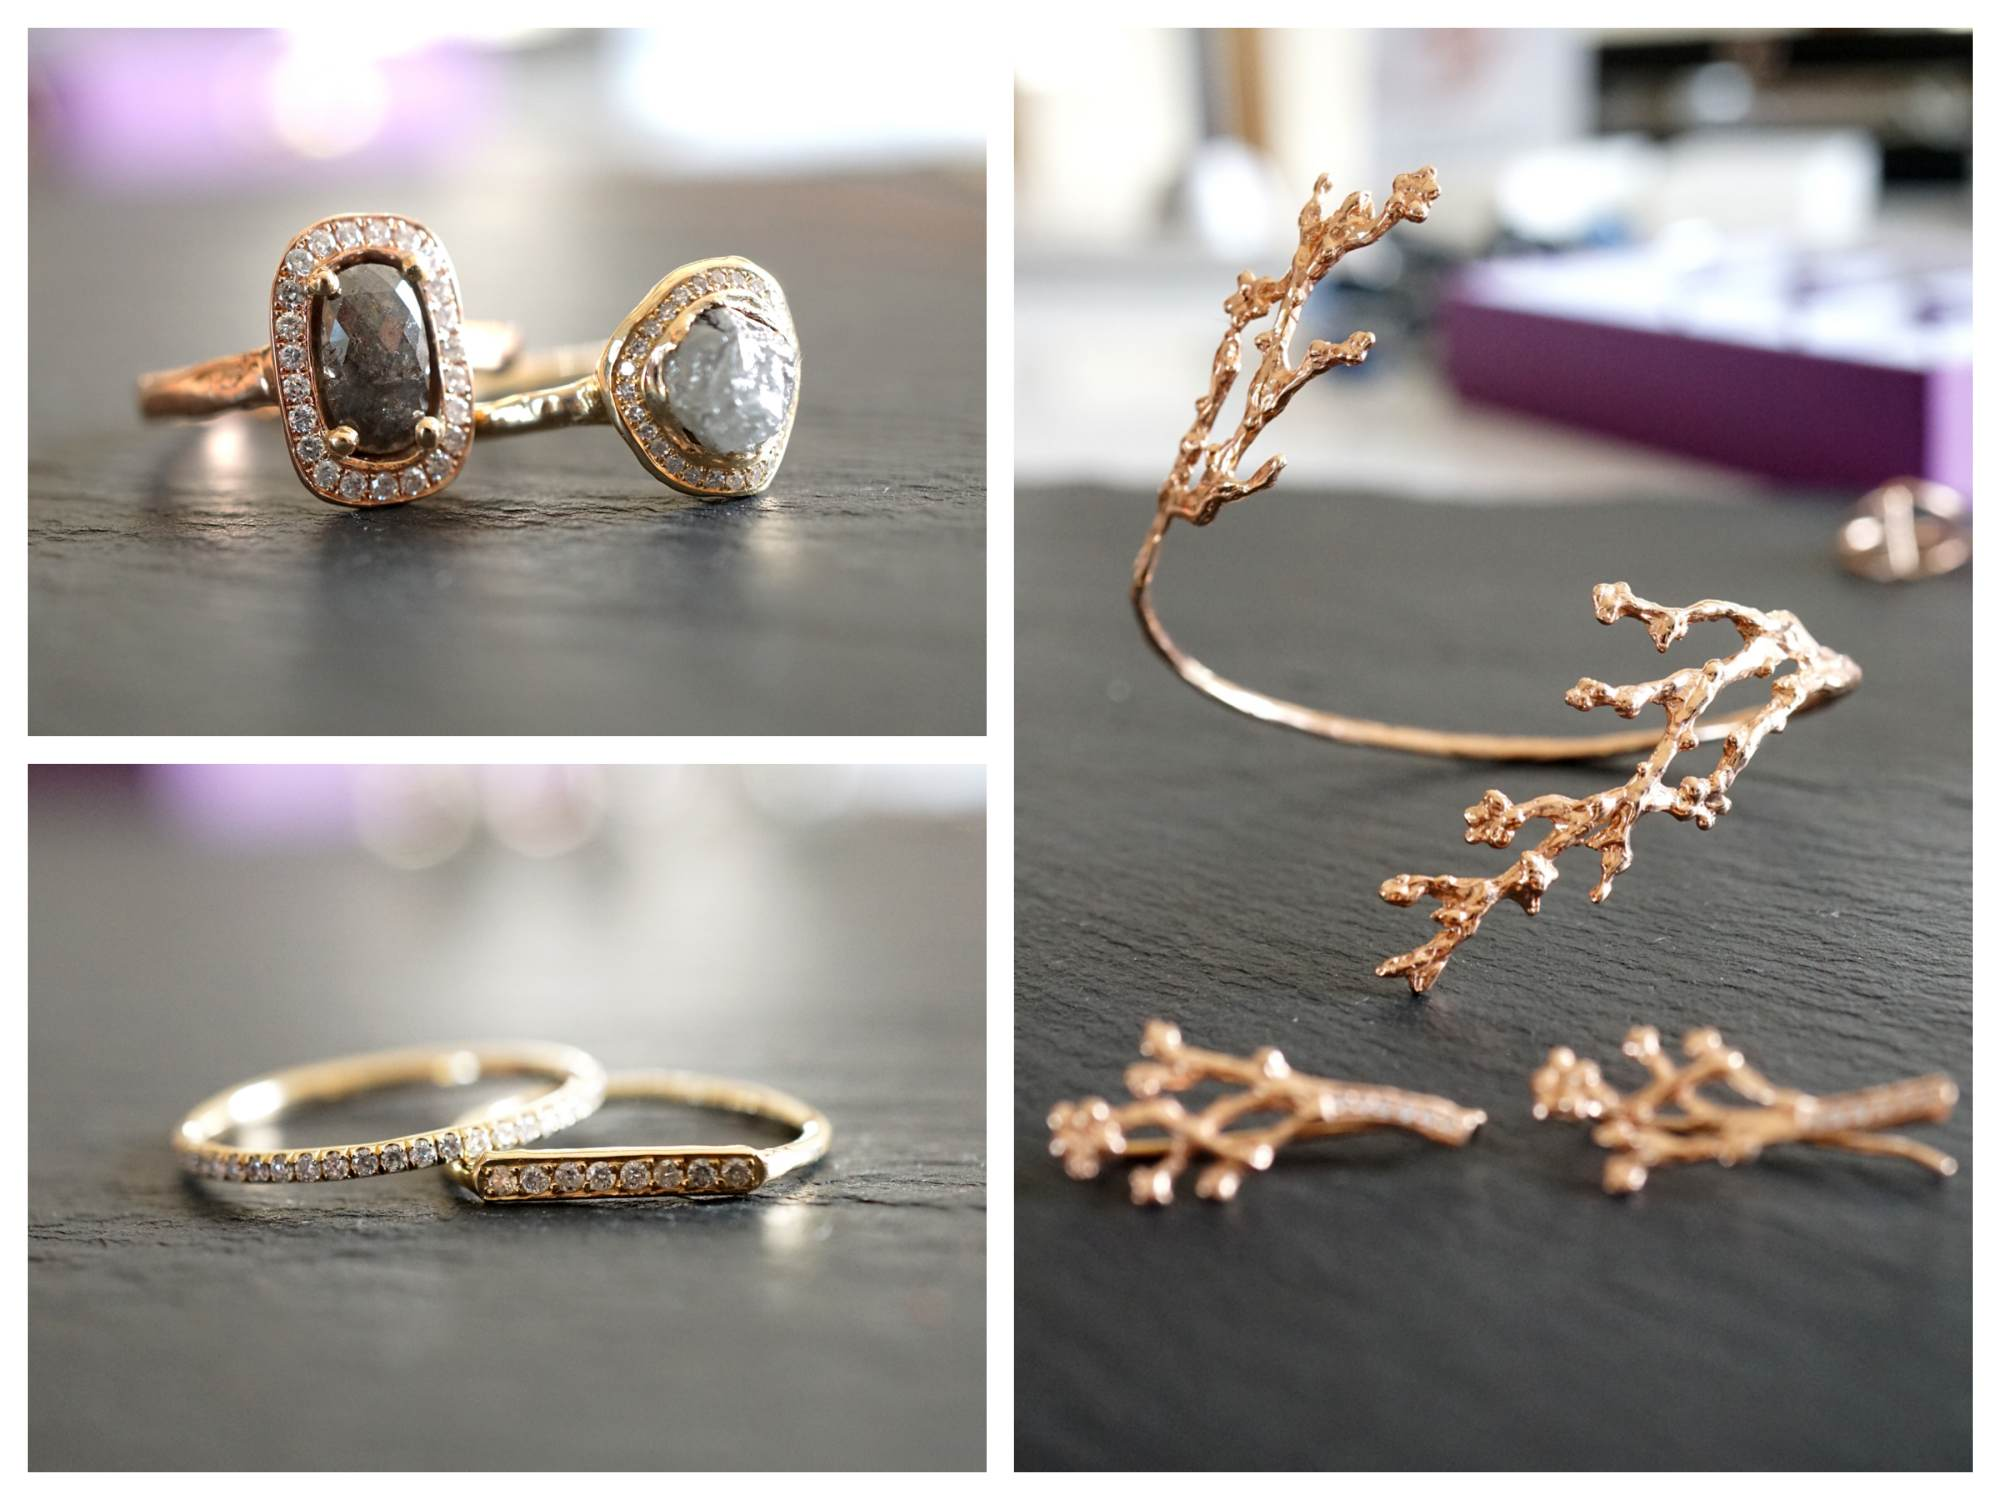 corinne simon jewelry 21